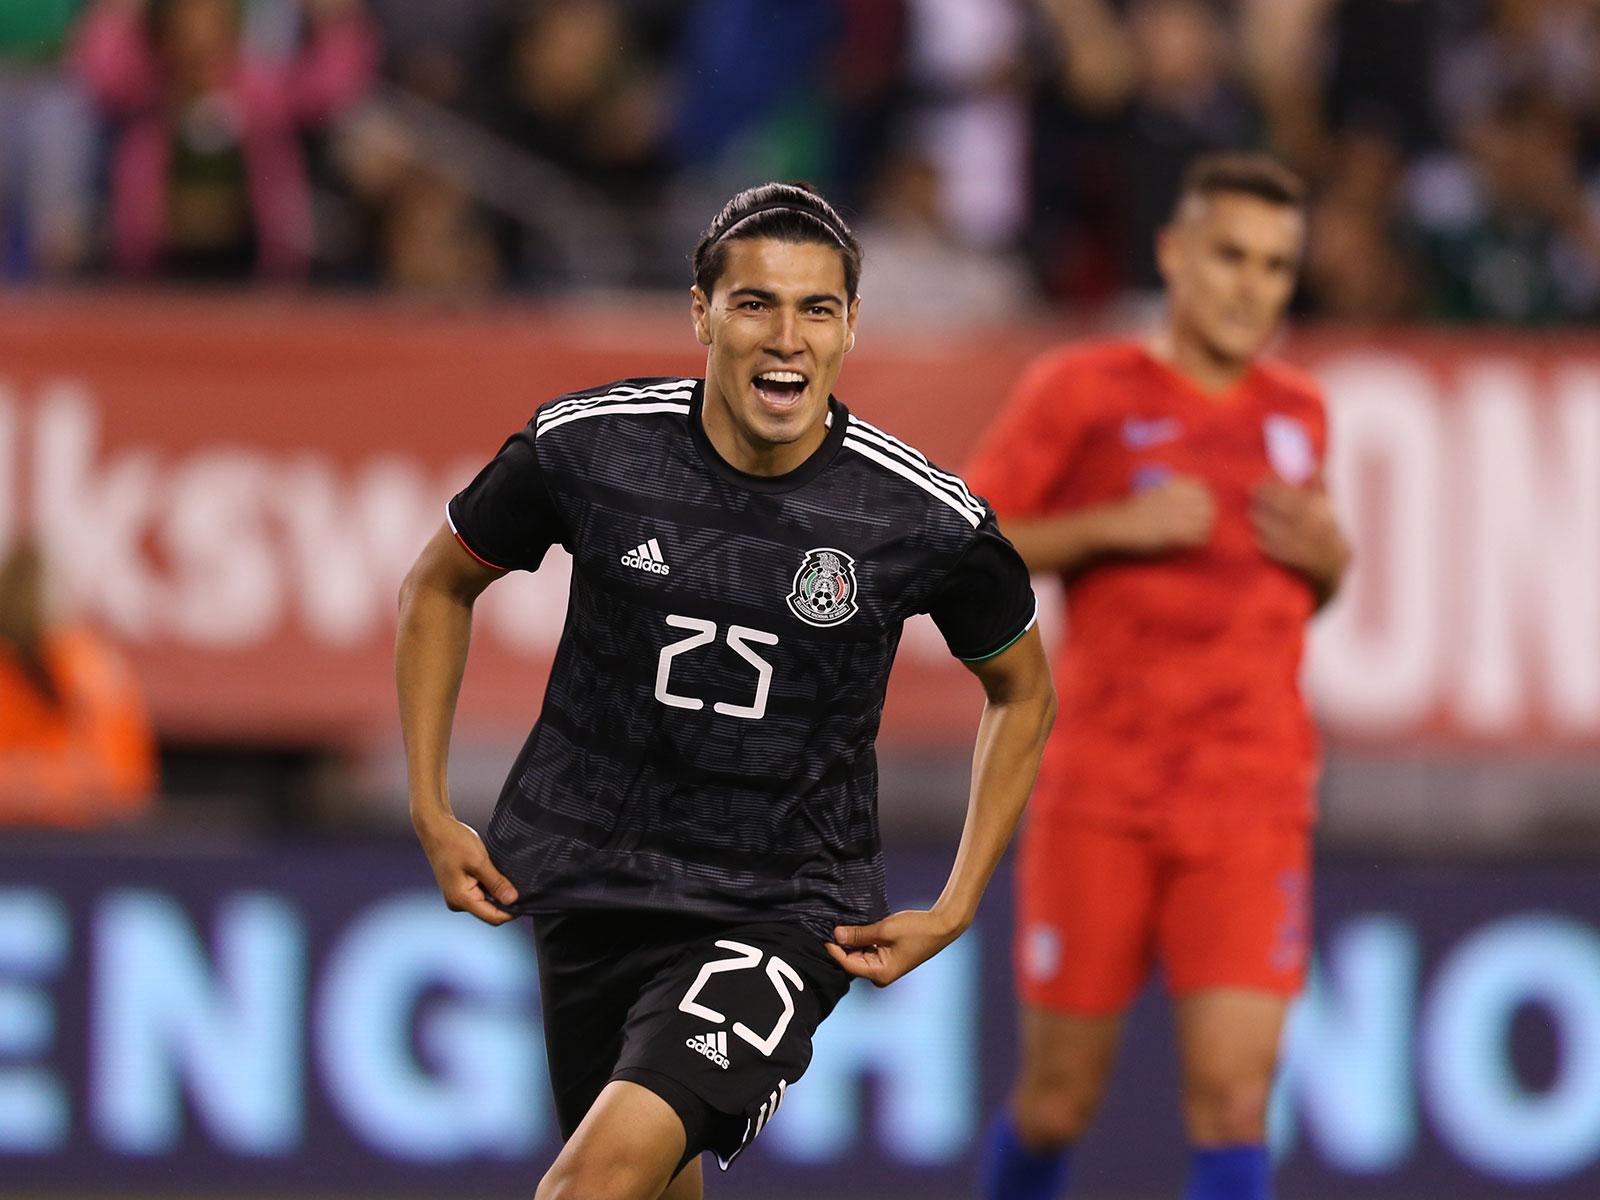 Erick Gutierrez scores for Mexico vs the USA